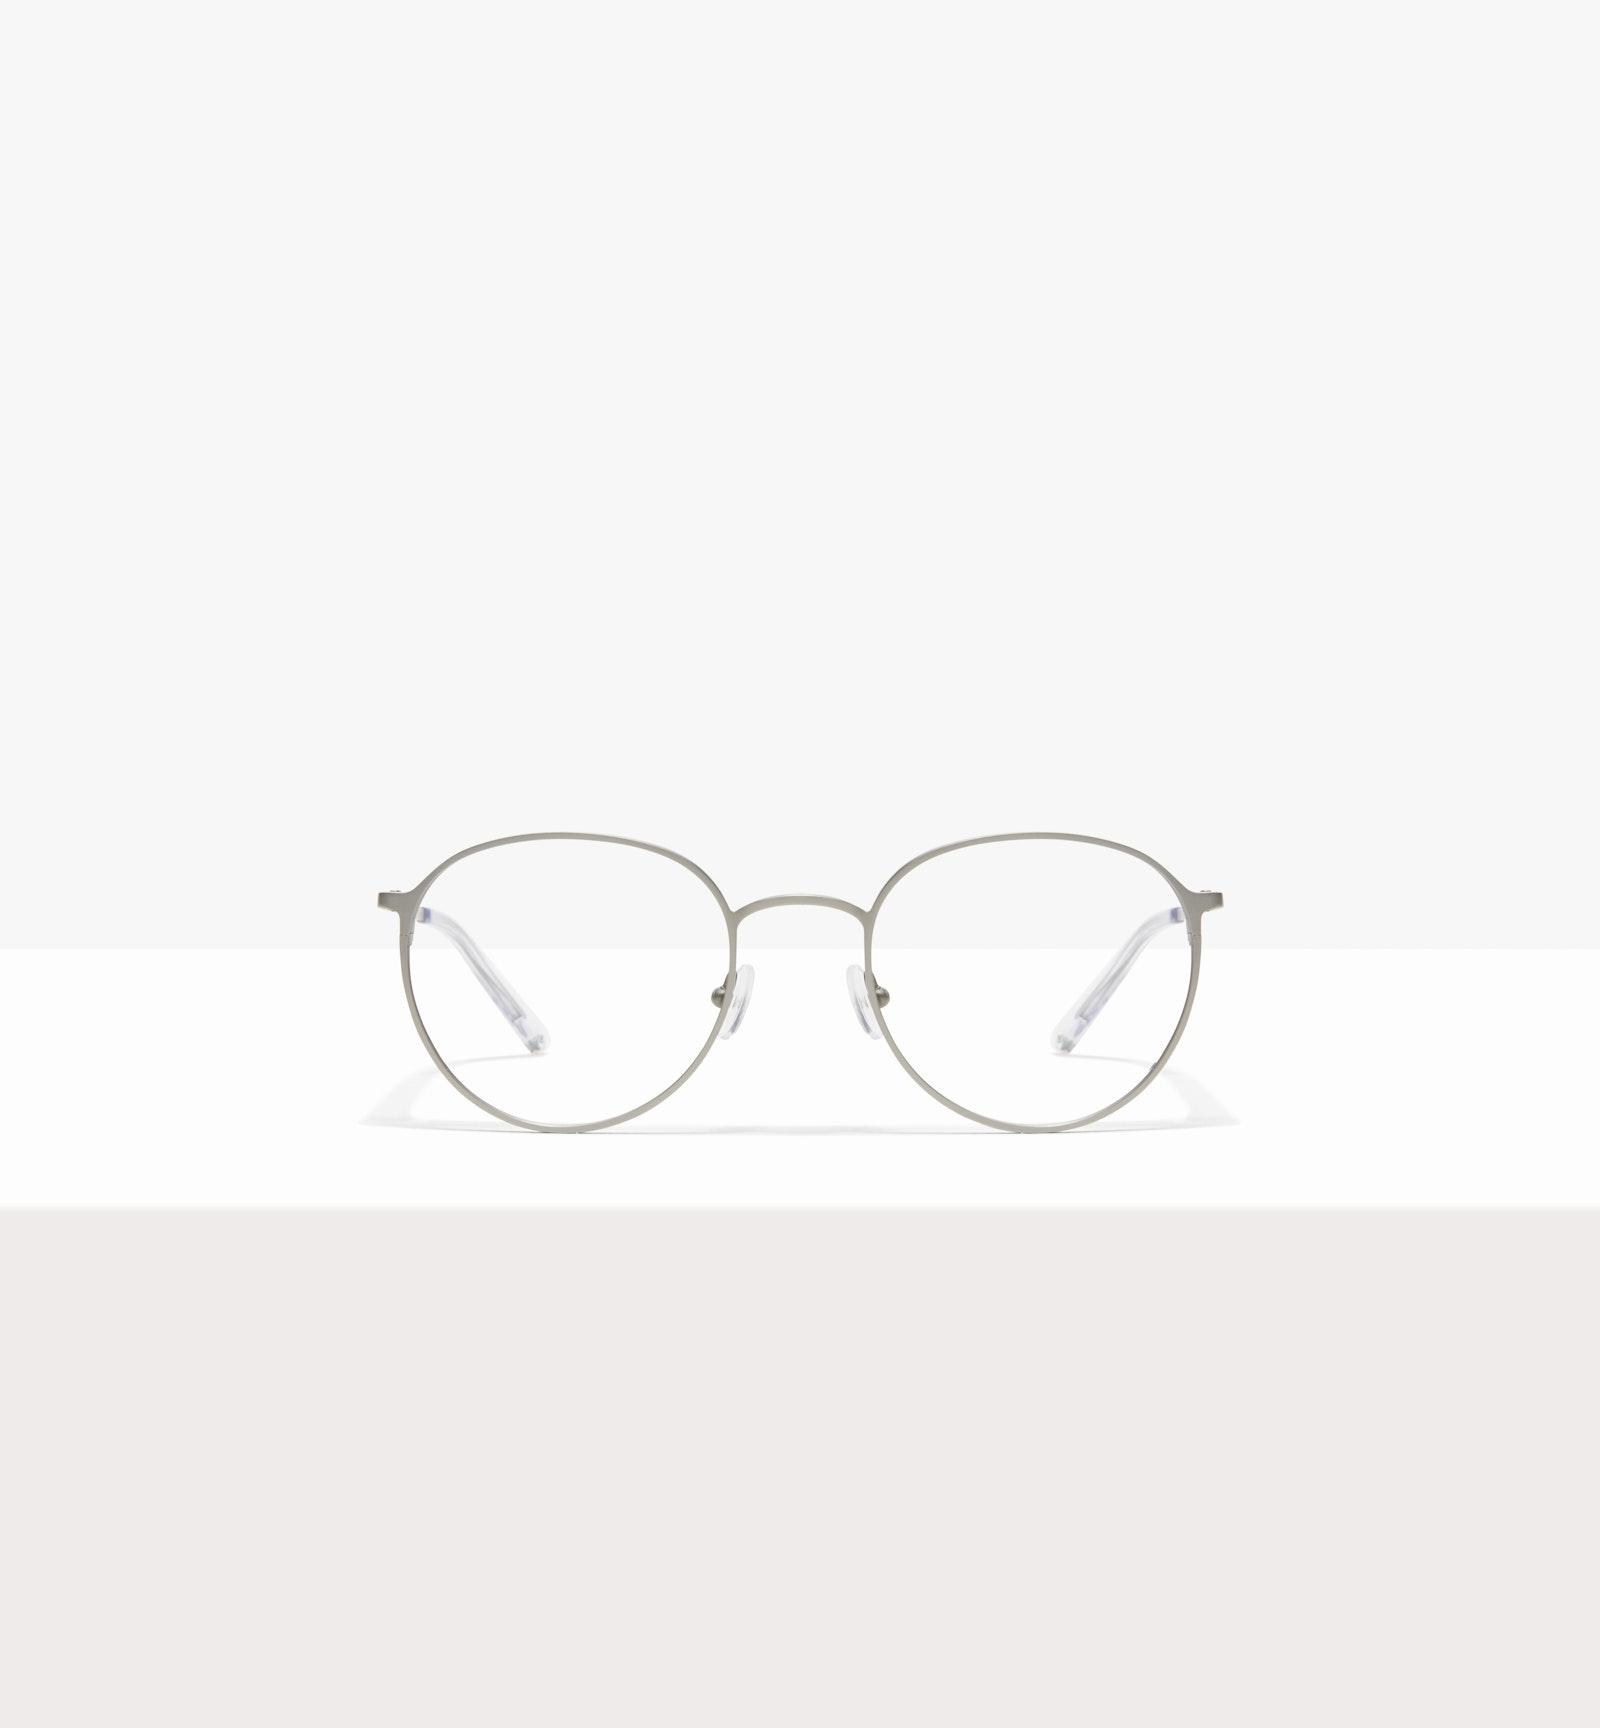 Affordable Fashion Glasses Round Eyeglasses Men Ridge Silver